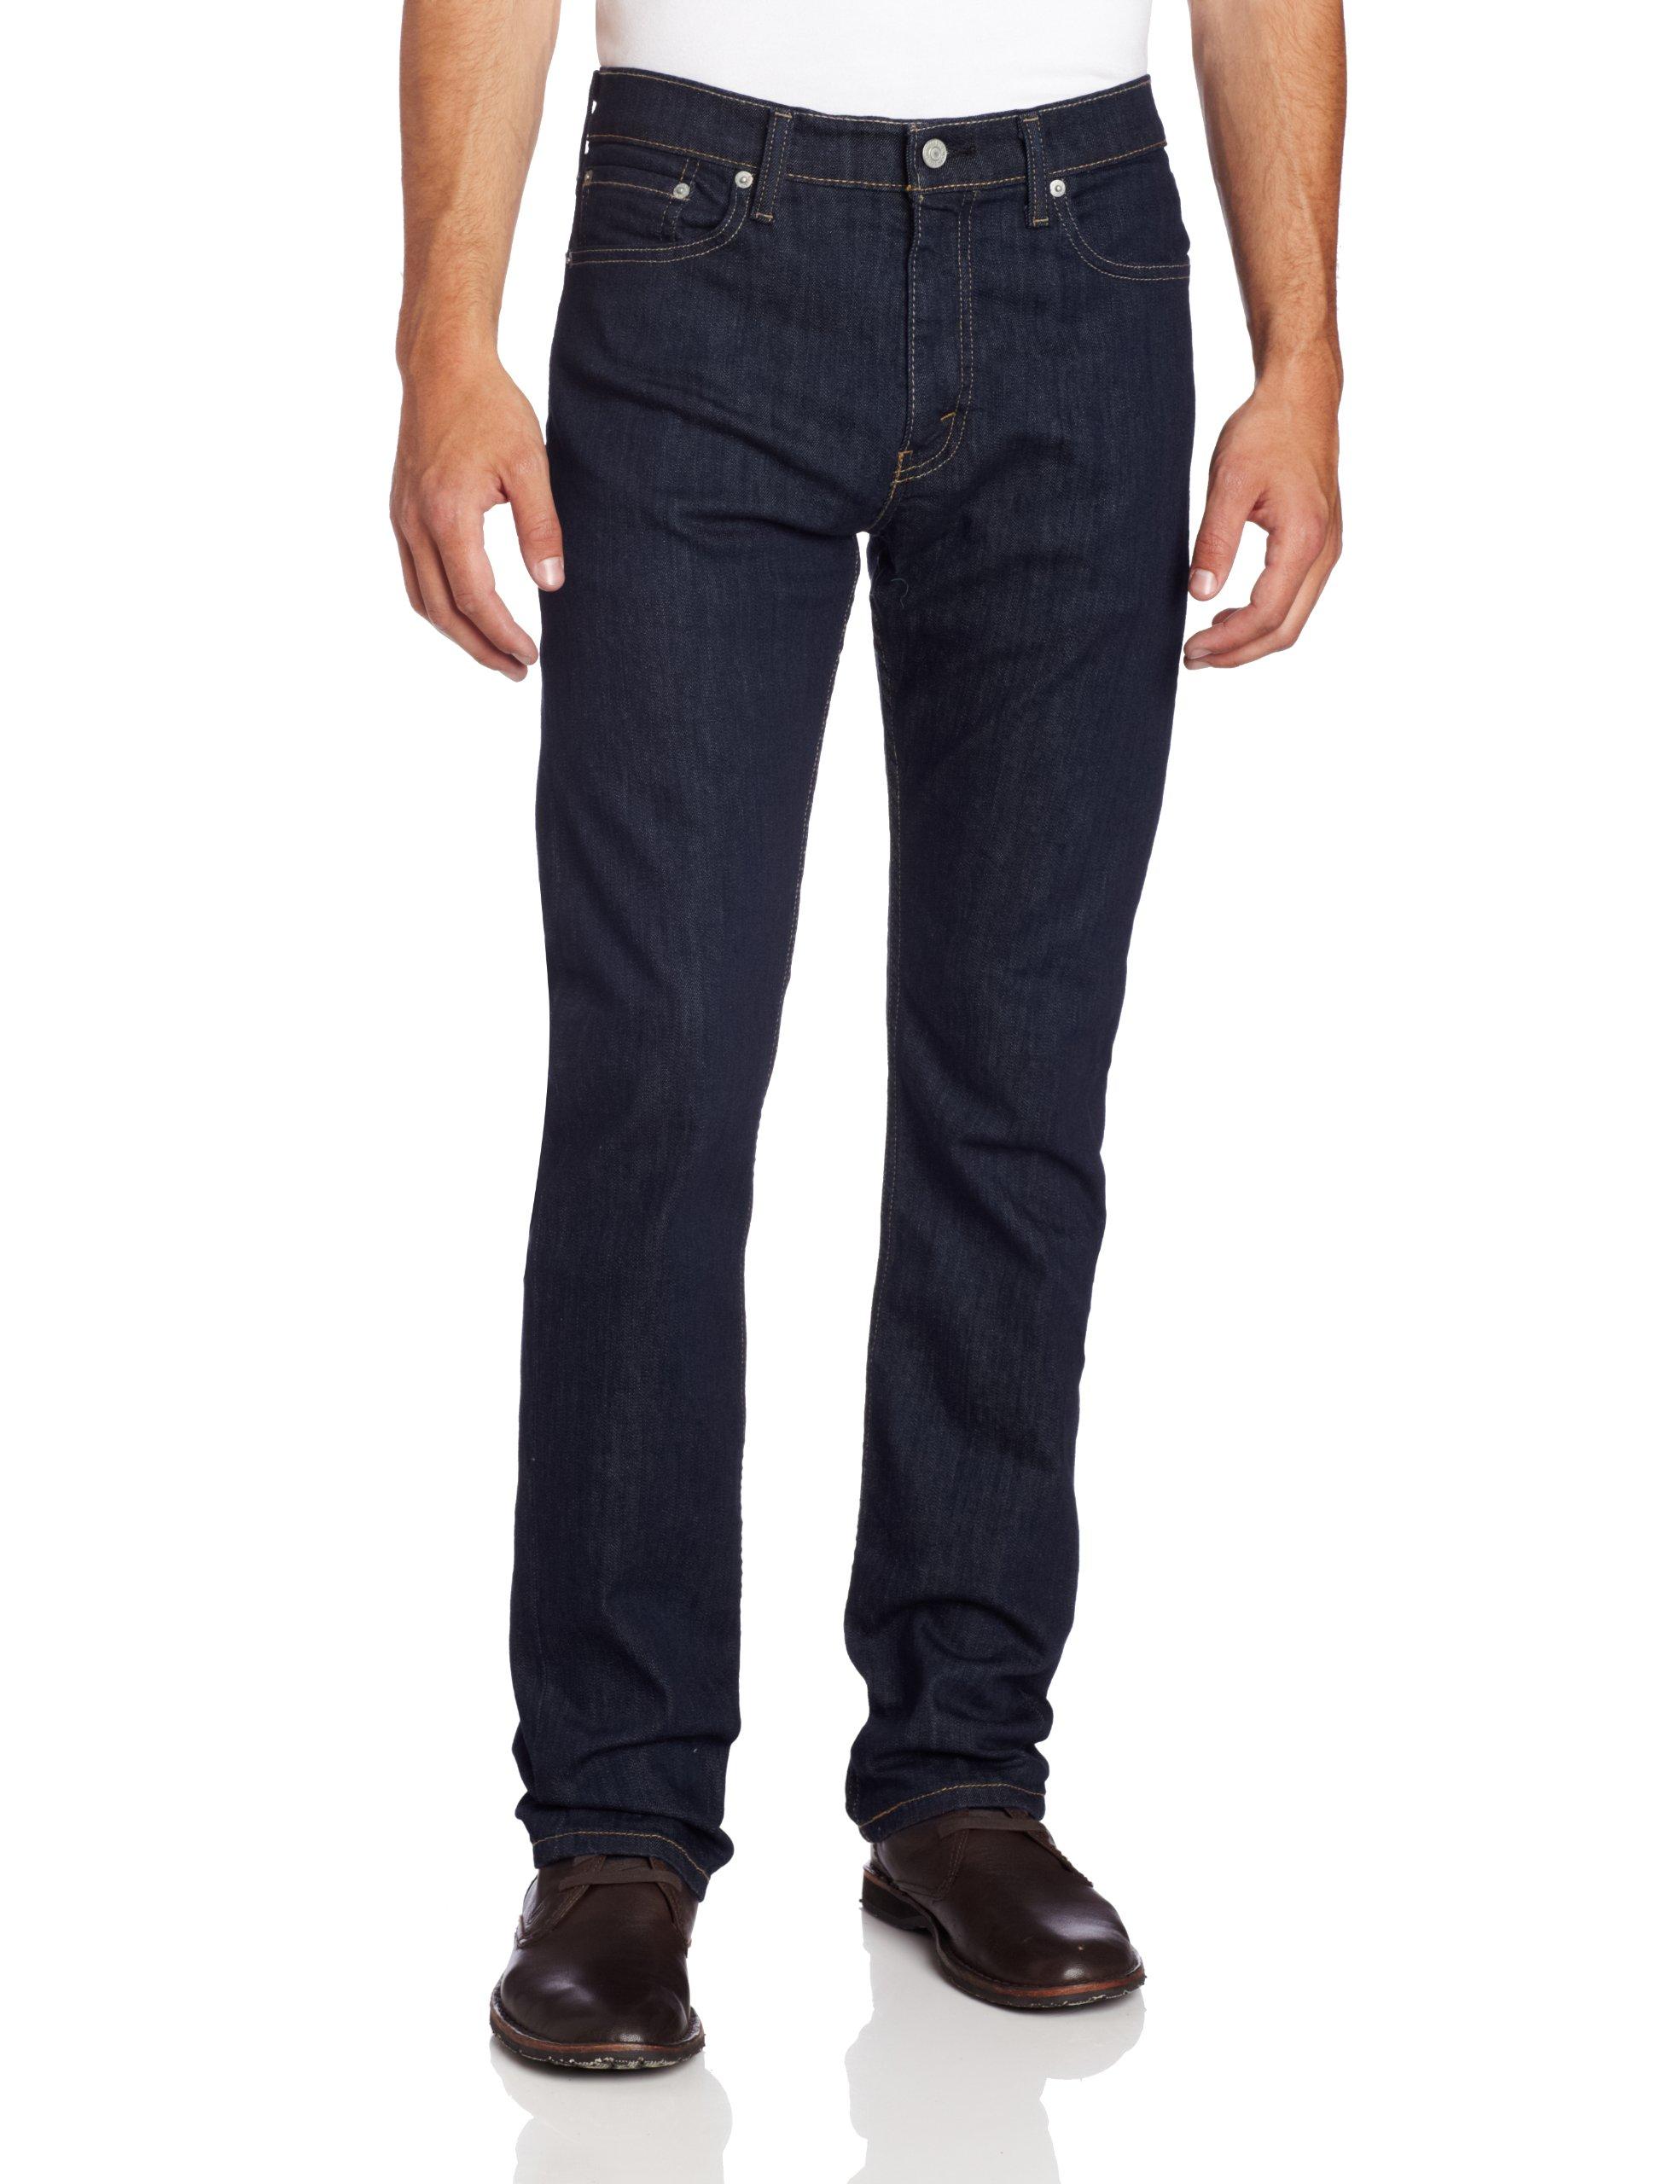 Levi's Men's 513 Stretch Slim Straight Jean, Bastion, 32x30 by Levi's